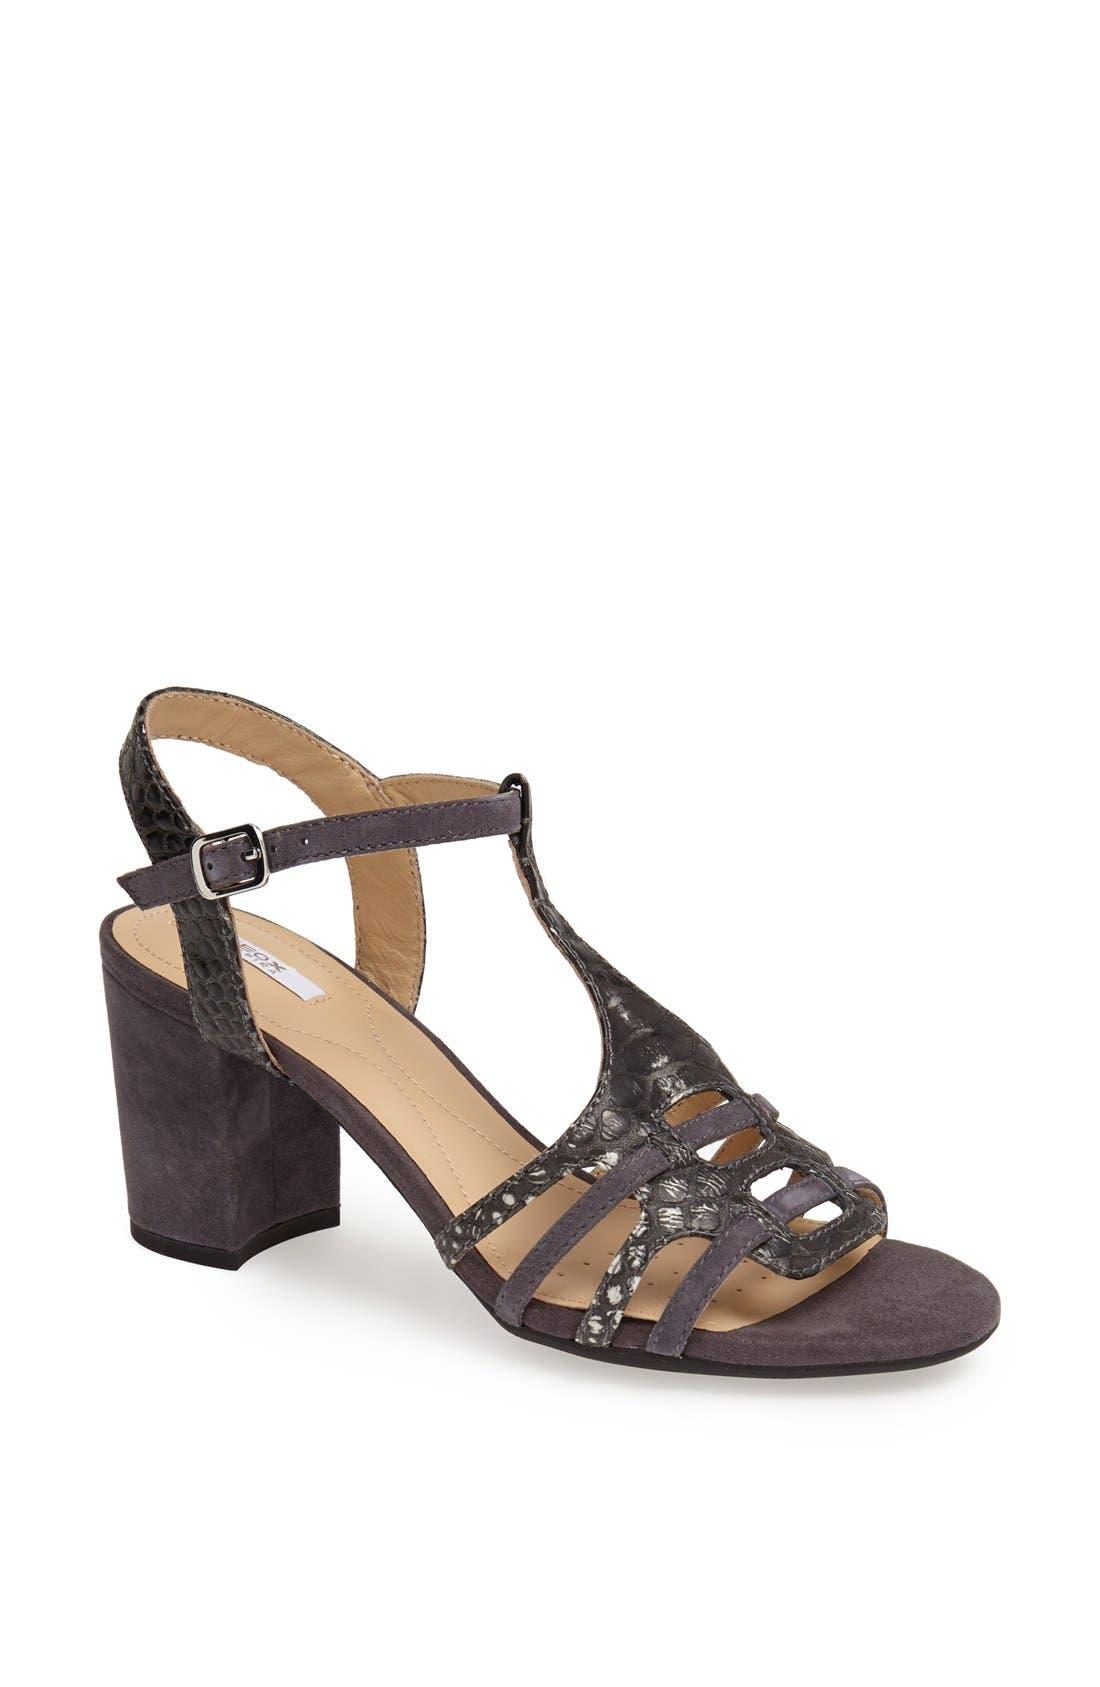 Alternate Image 1 Selected - Geox 'Nesa' Sandal